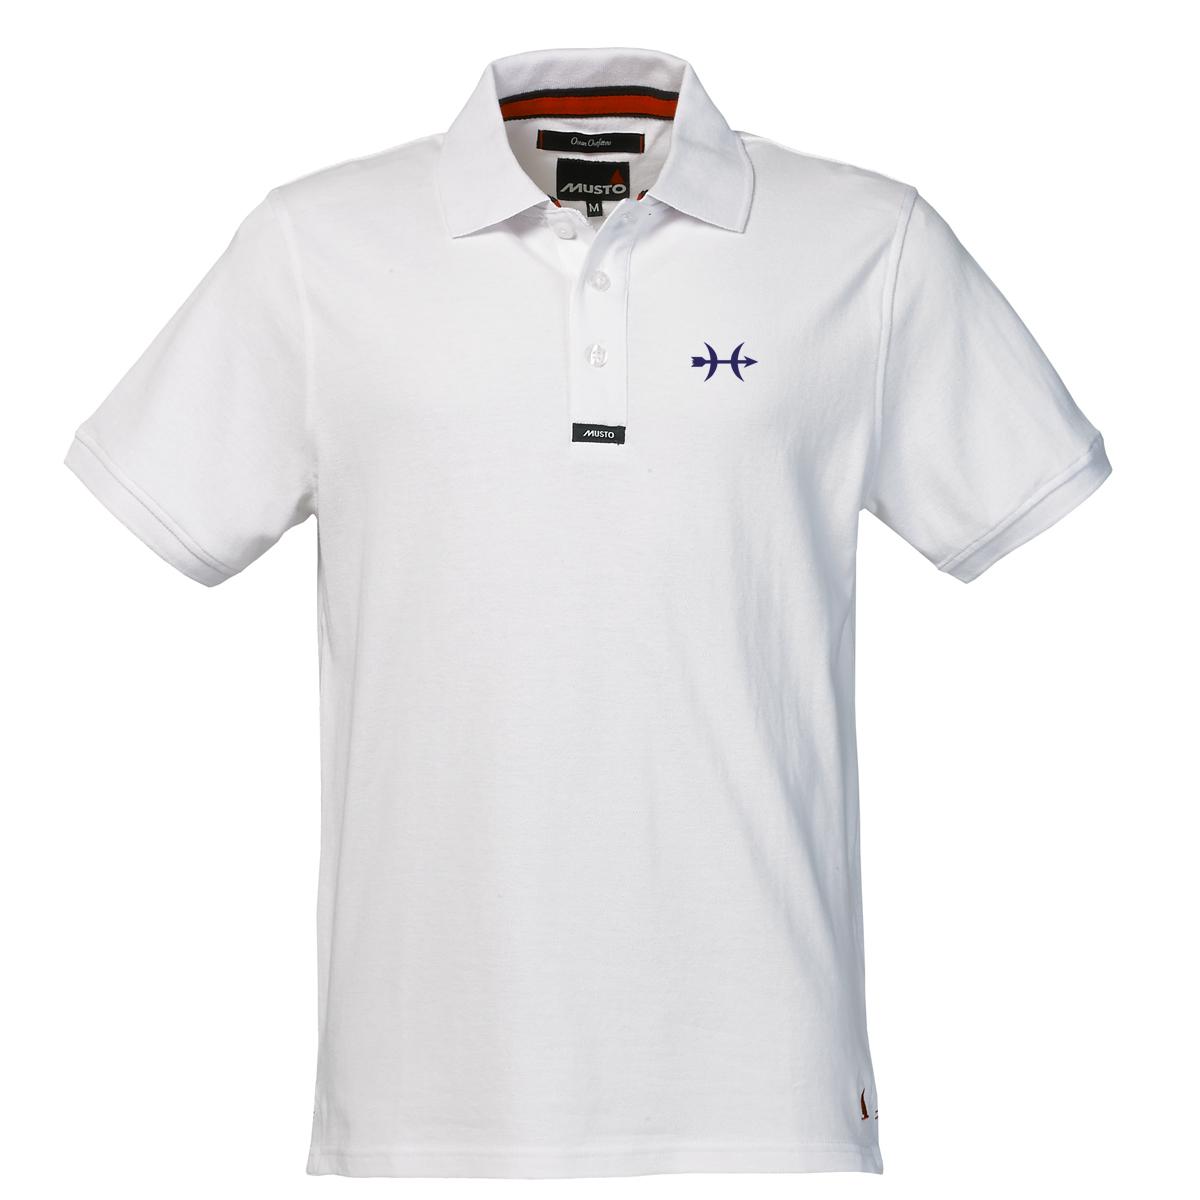 Hunt Yachts - M's Cotton Polo